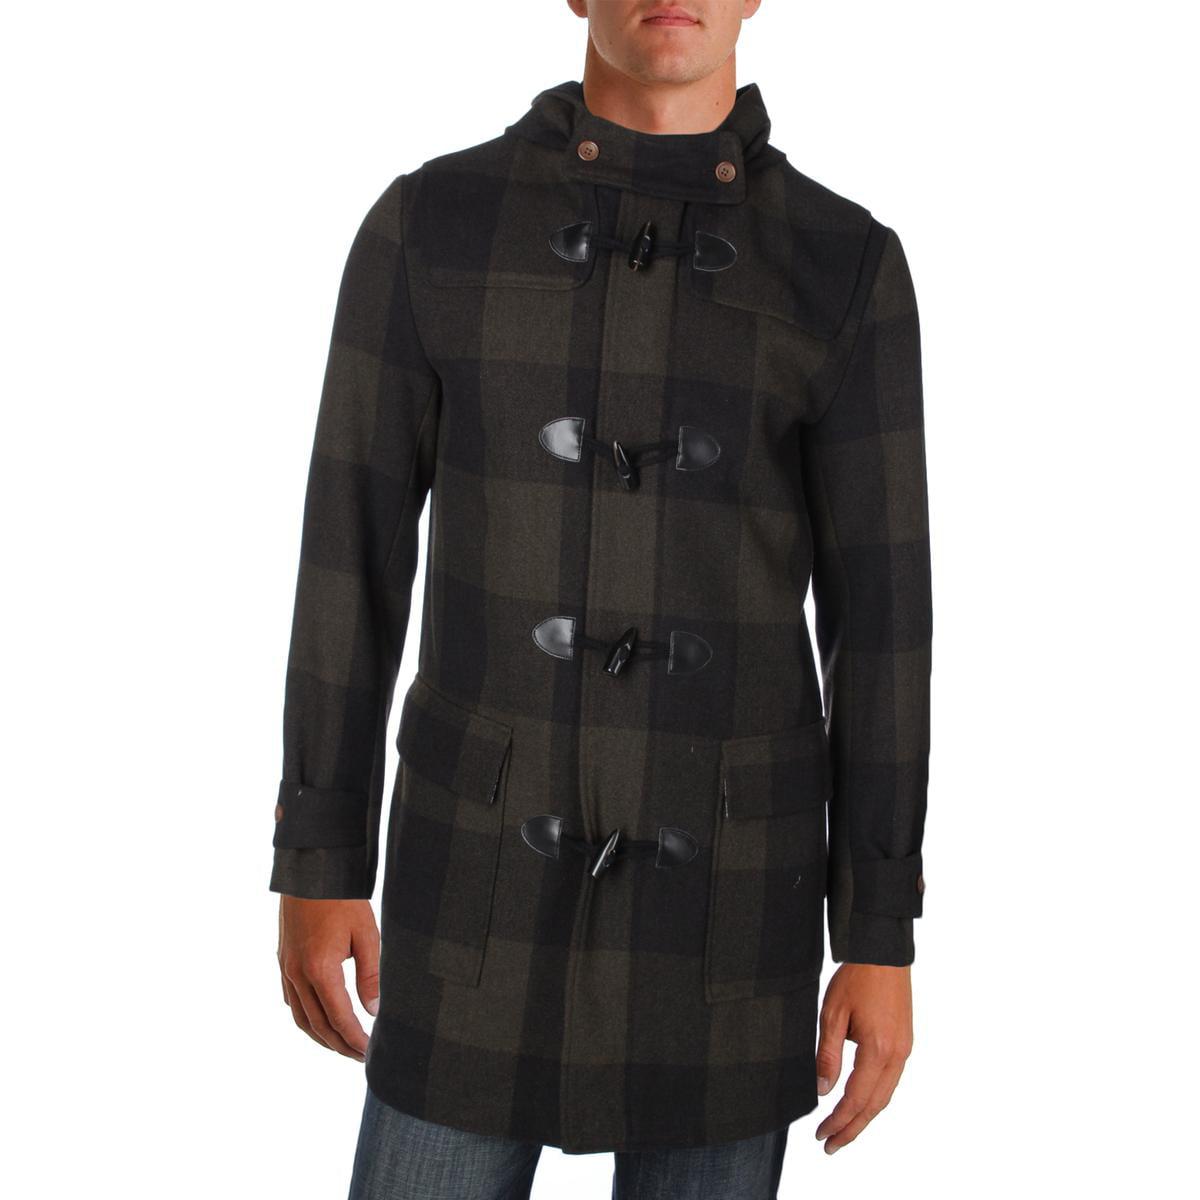 Penguin By Munsingwear Mens Paddington Checkered Wool Blend Duffle Coat by Penguin By Munsingwear